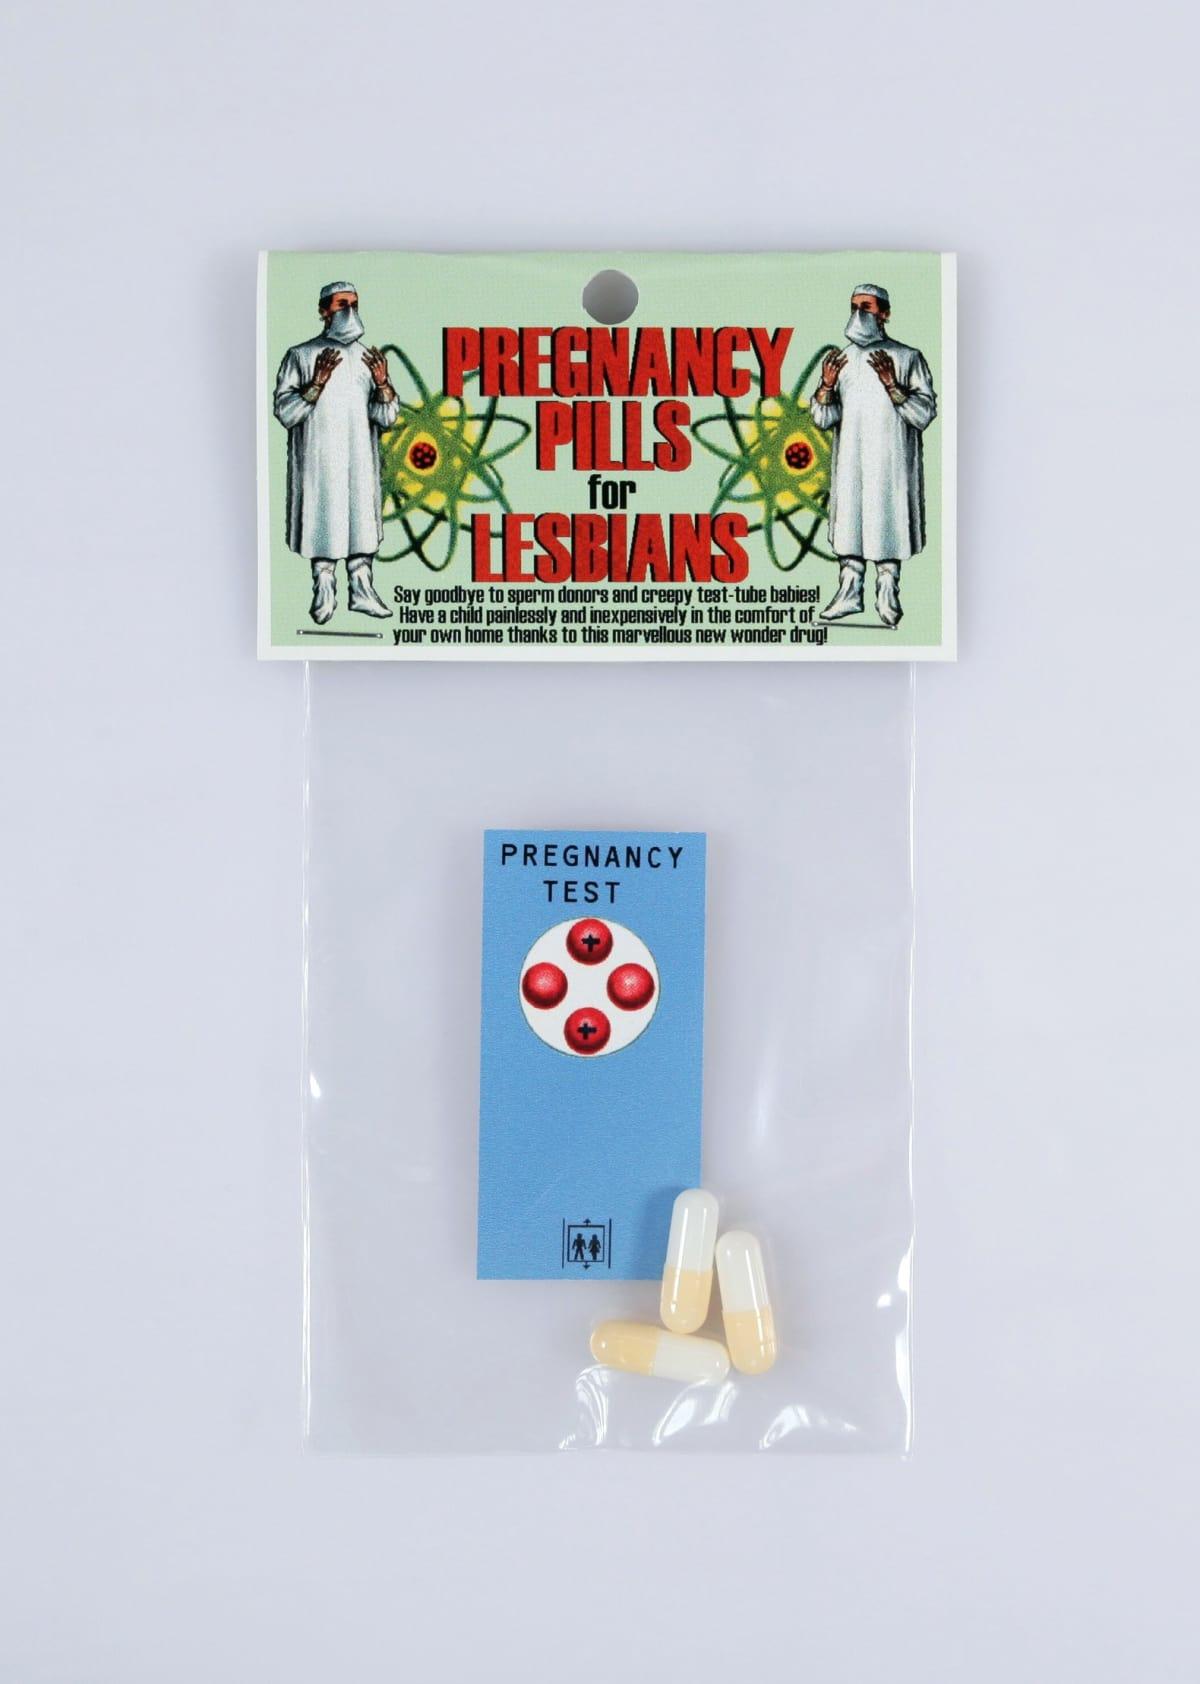 Pregnancy pills for lesbians, 1997